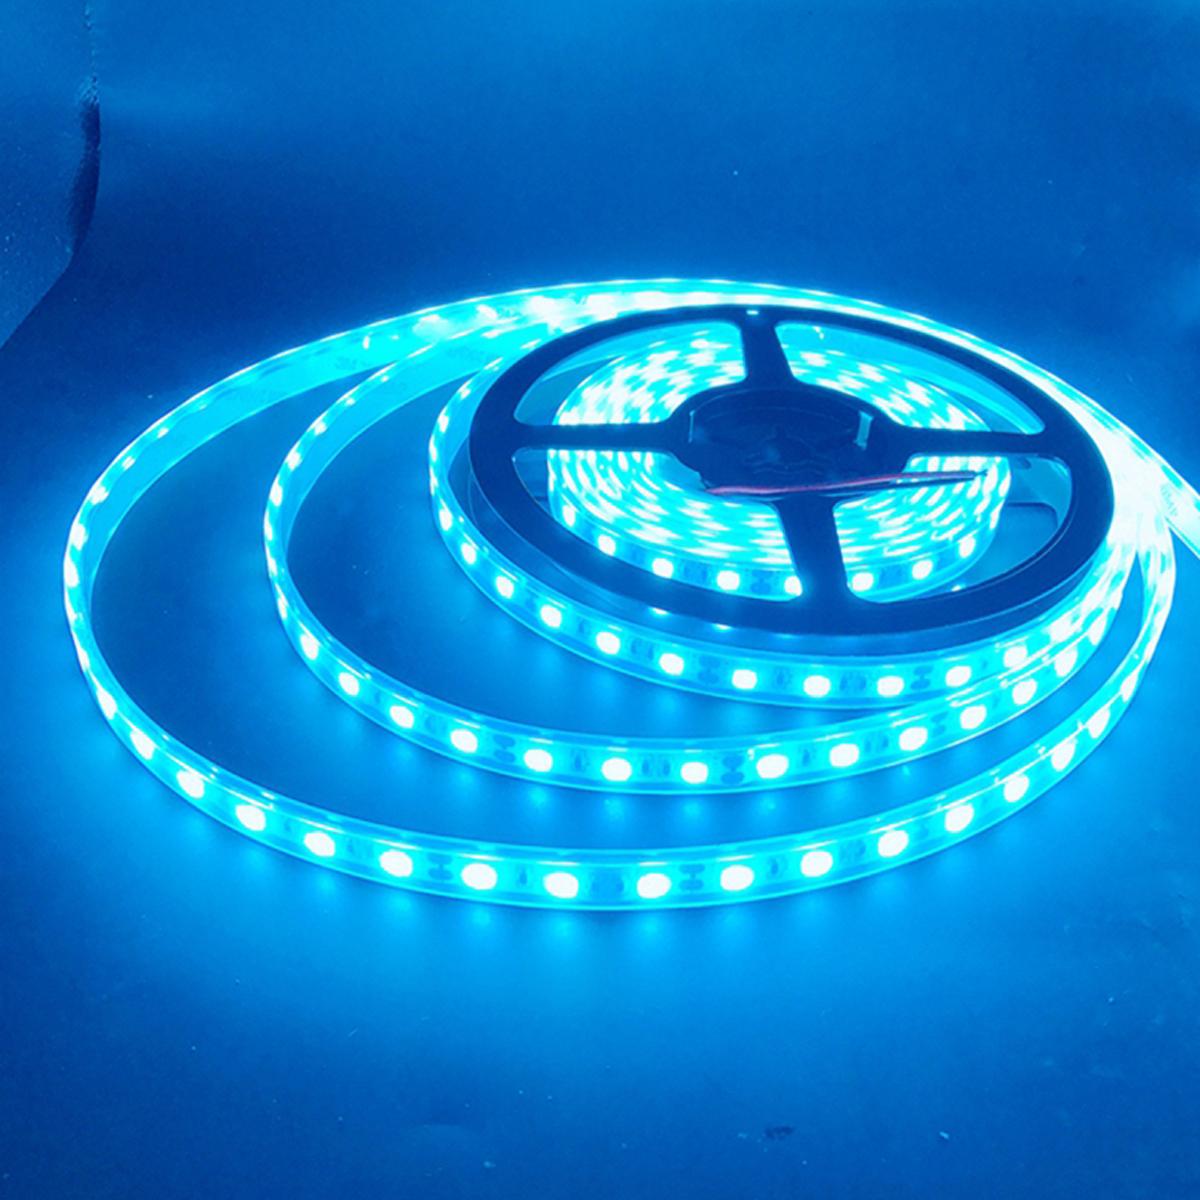 Waterproof 5050 Tape Light: 1/2/3/4/5M SMD 5050 RGB White Blue Waterproof LED Flexible